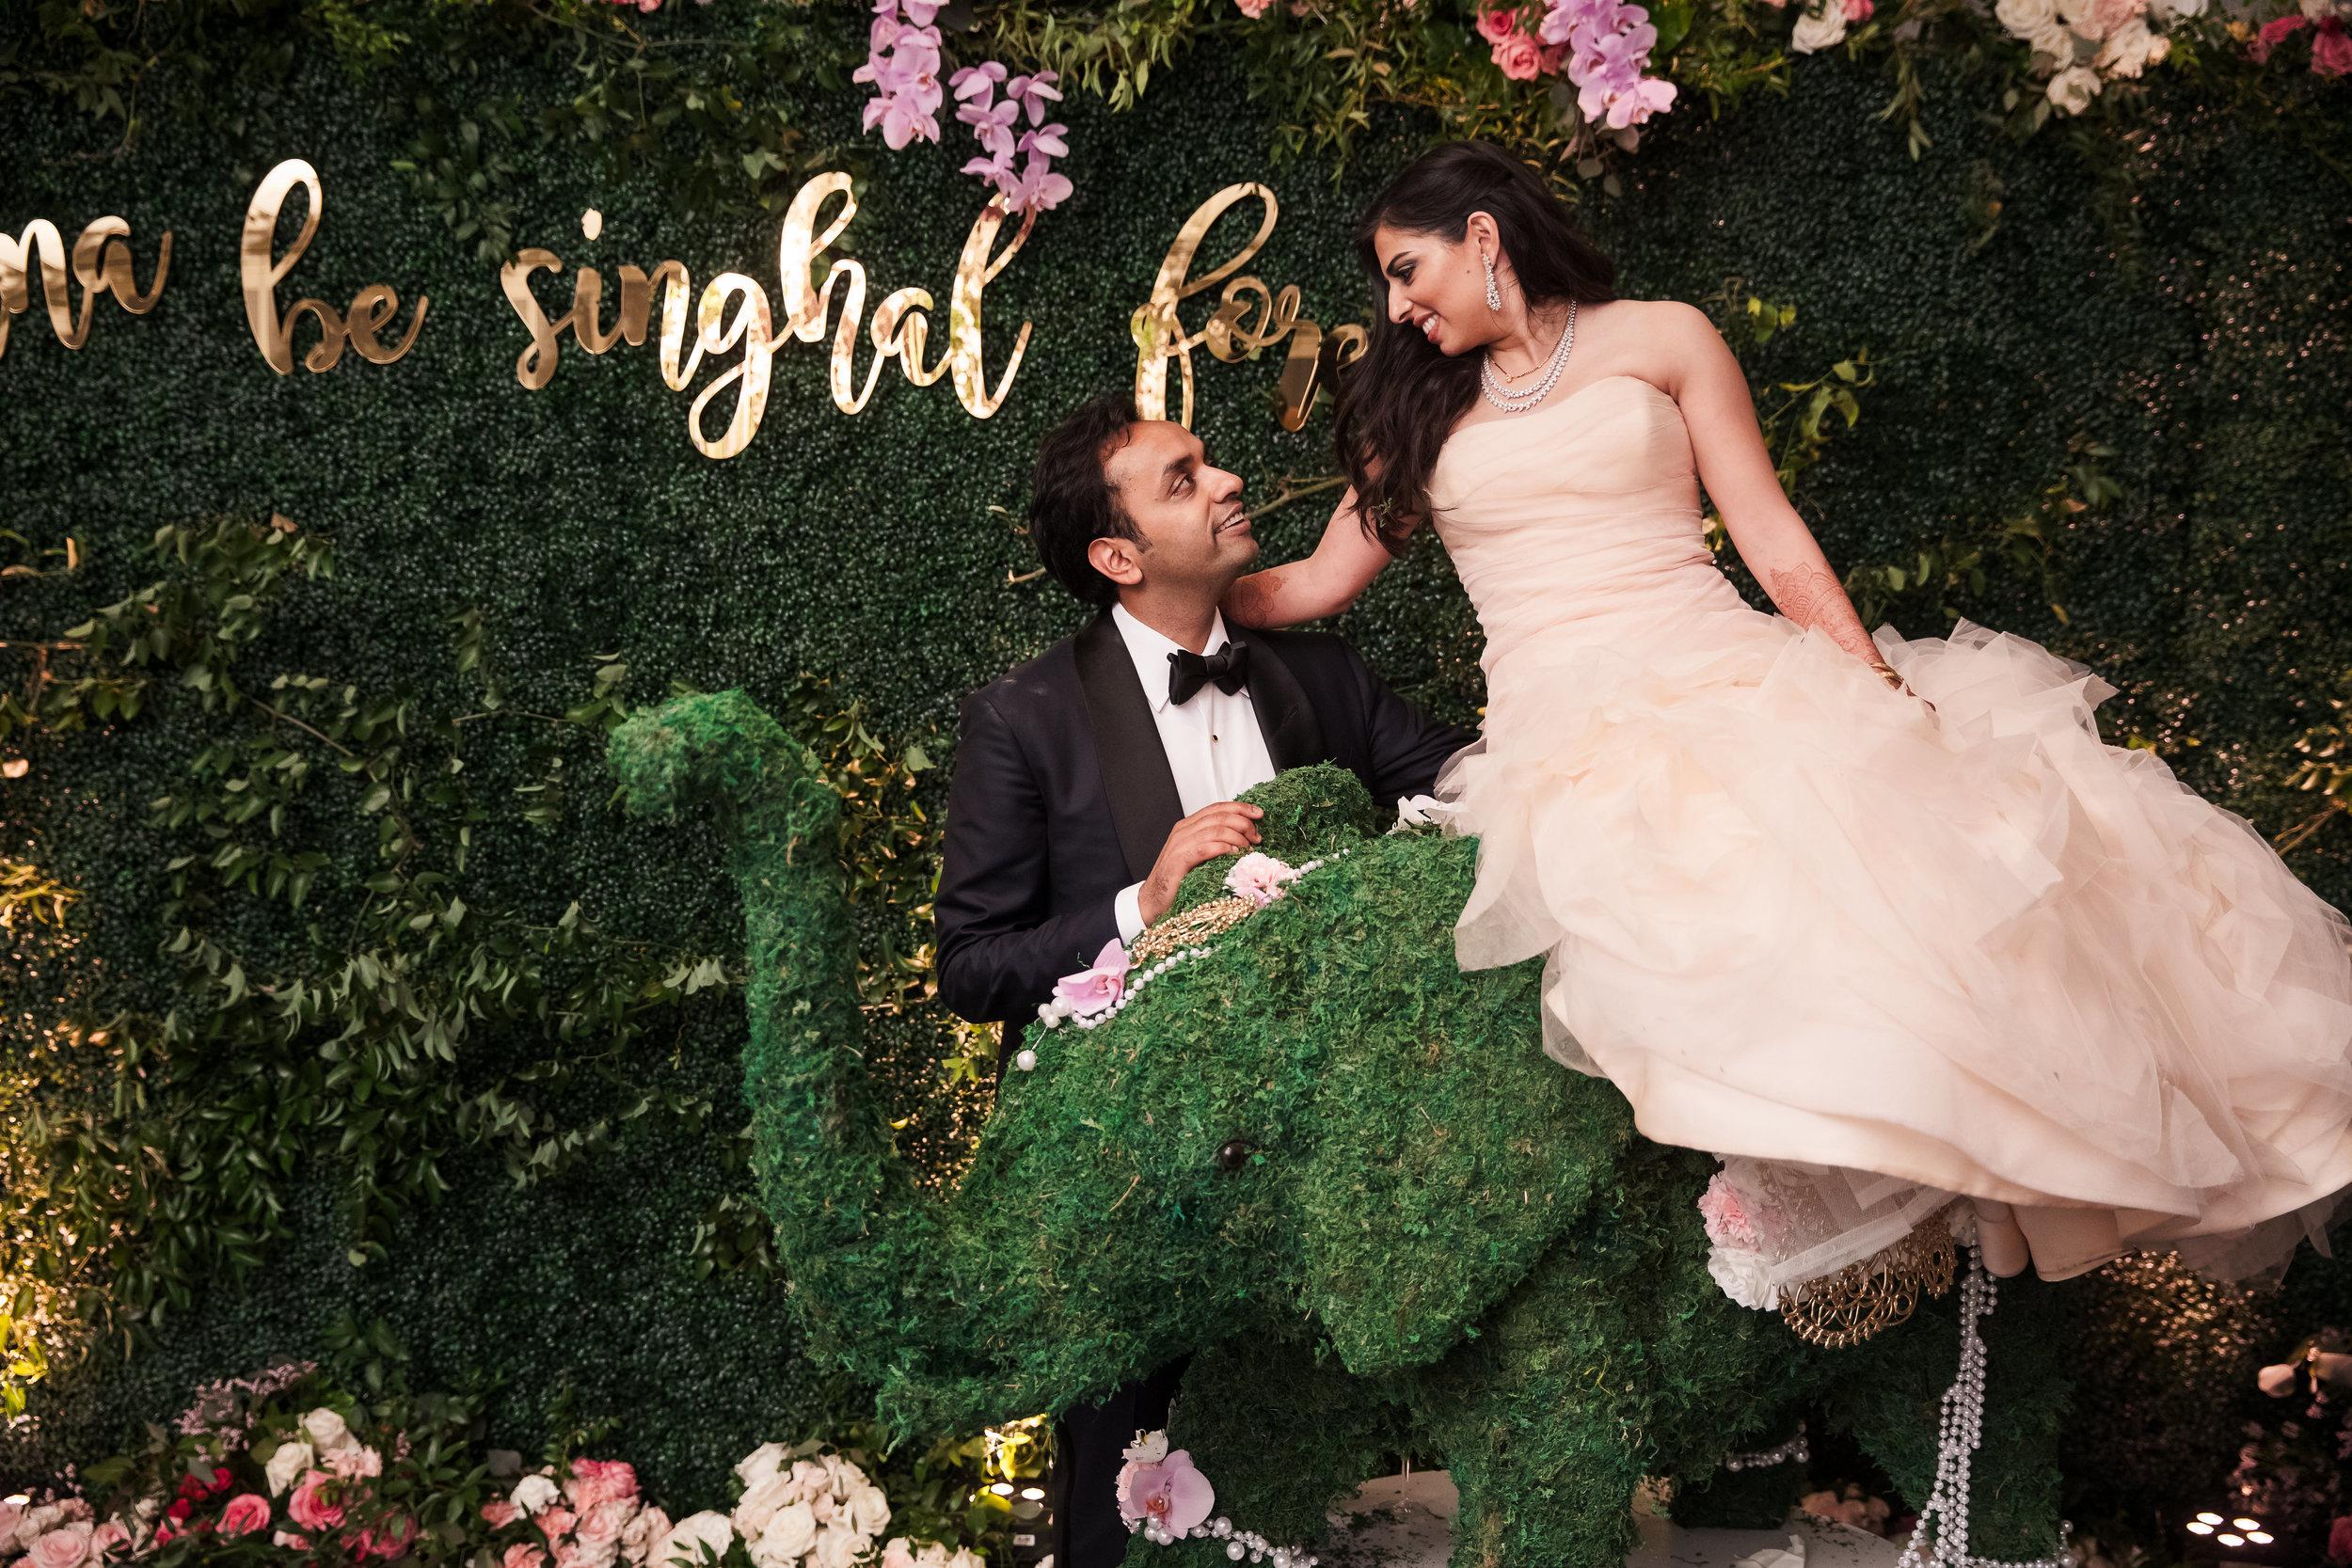 INDIAN WEDDING BRIDE AND GROOM WIT FLOWER ELEPHANT.jpg